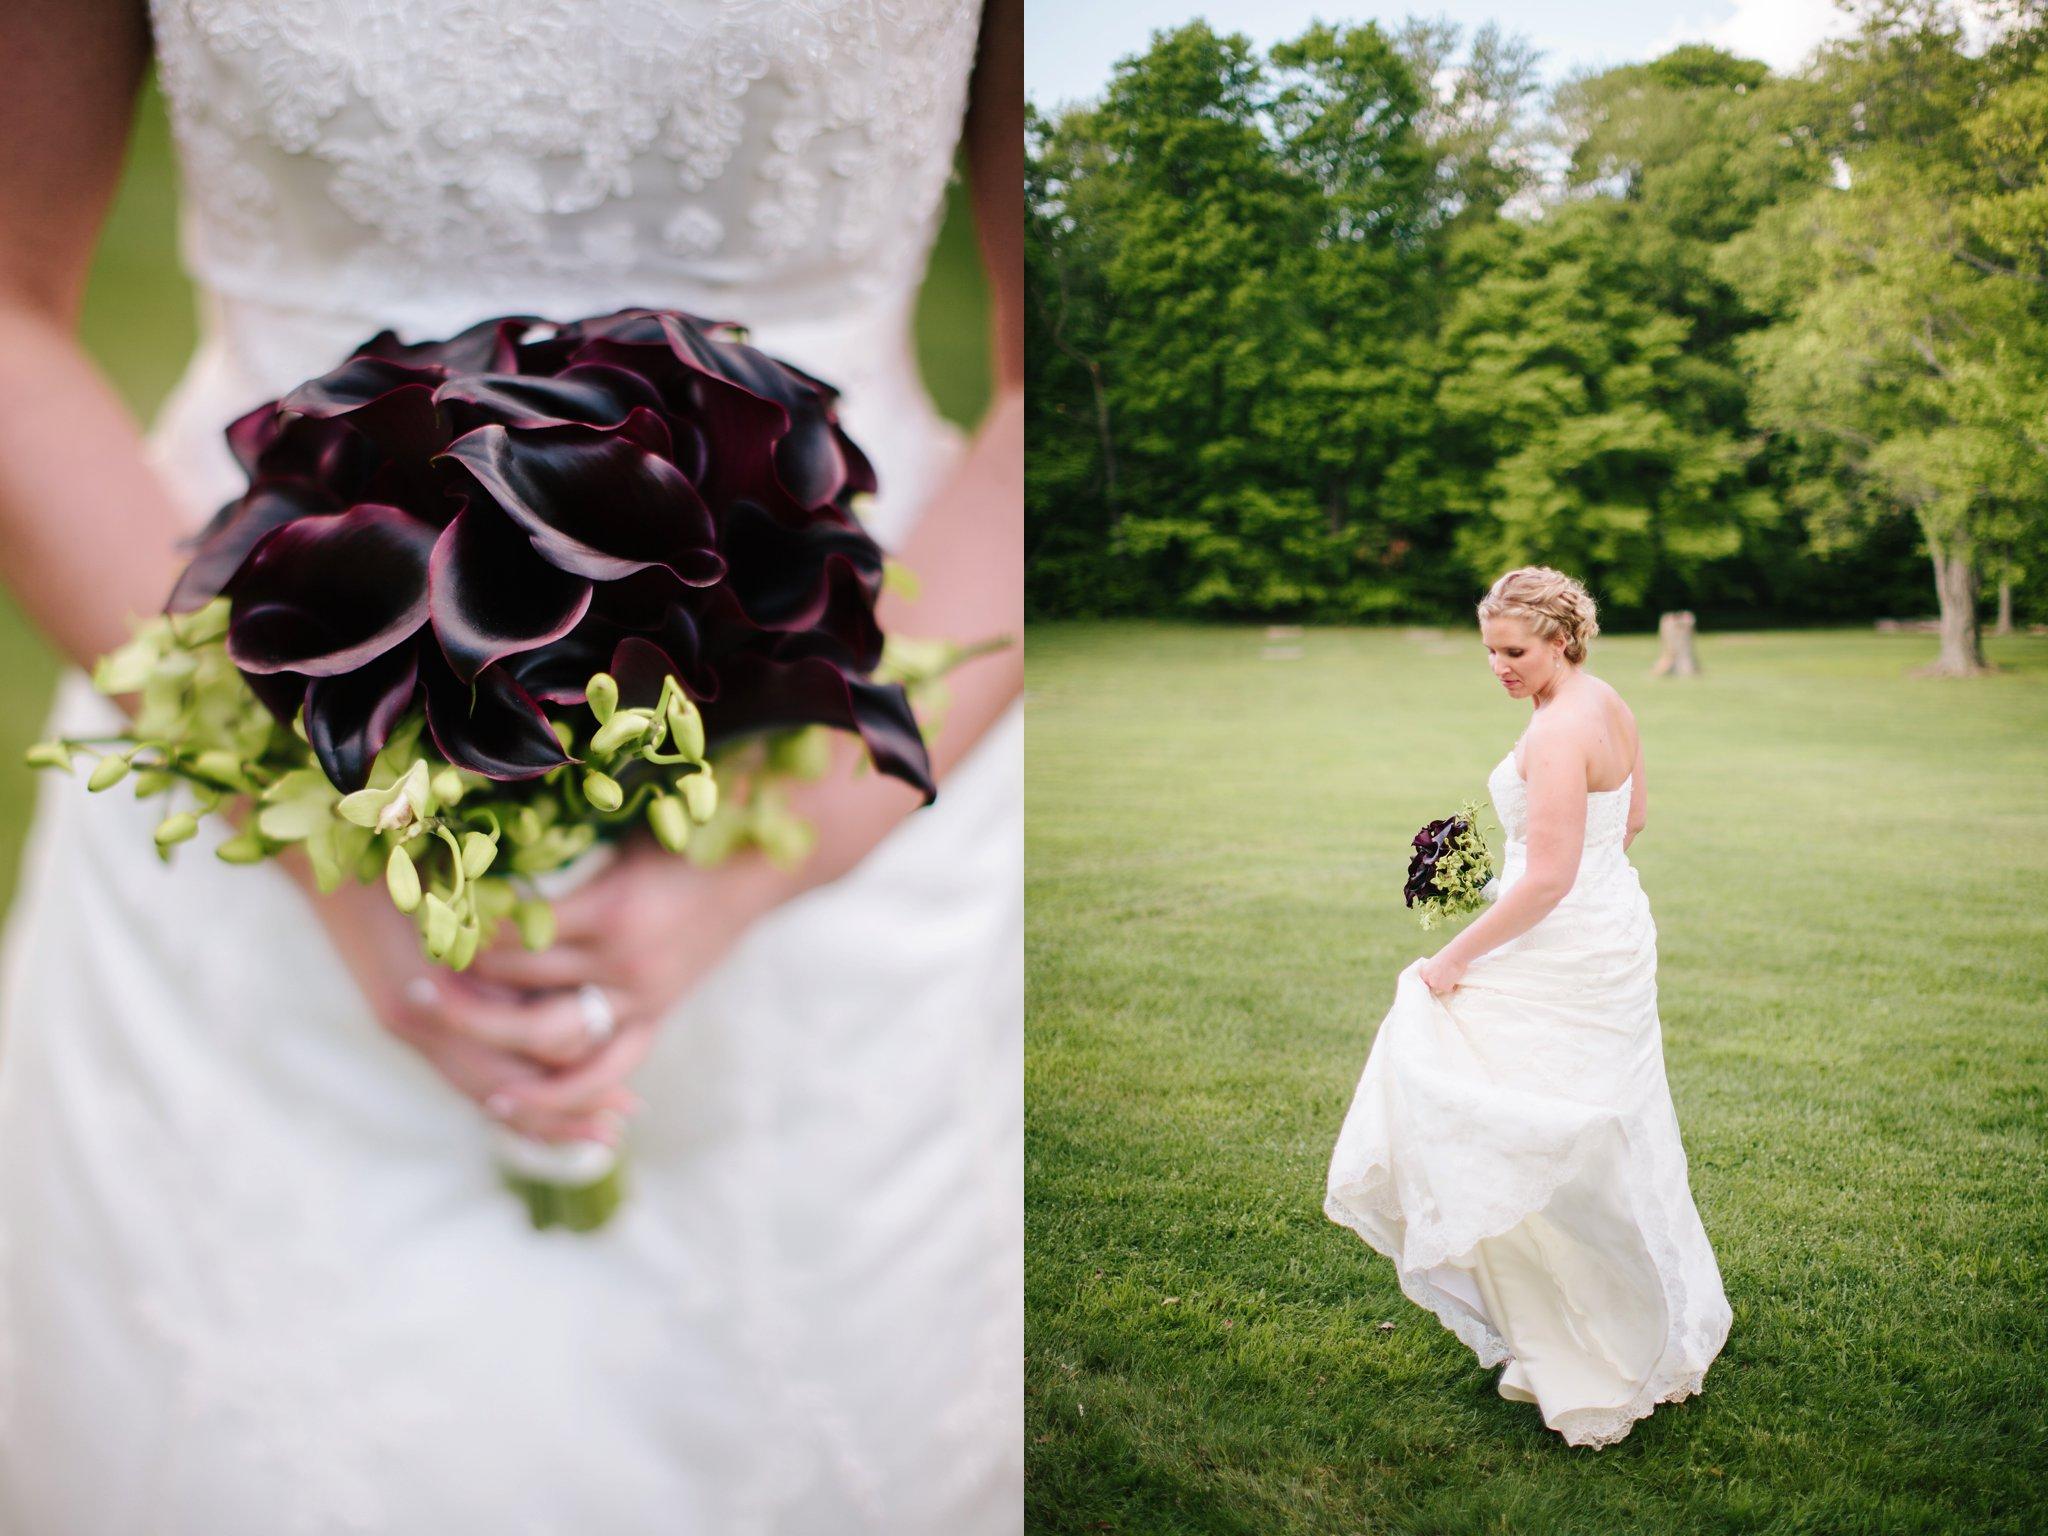 montdale_country_club_wedding_photos_photographer_scranton_pa7389.jpg